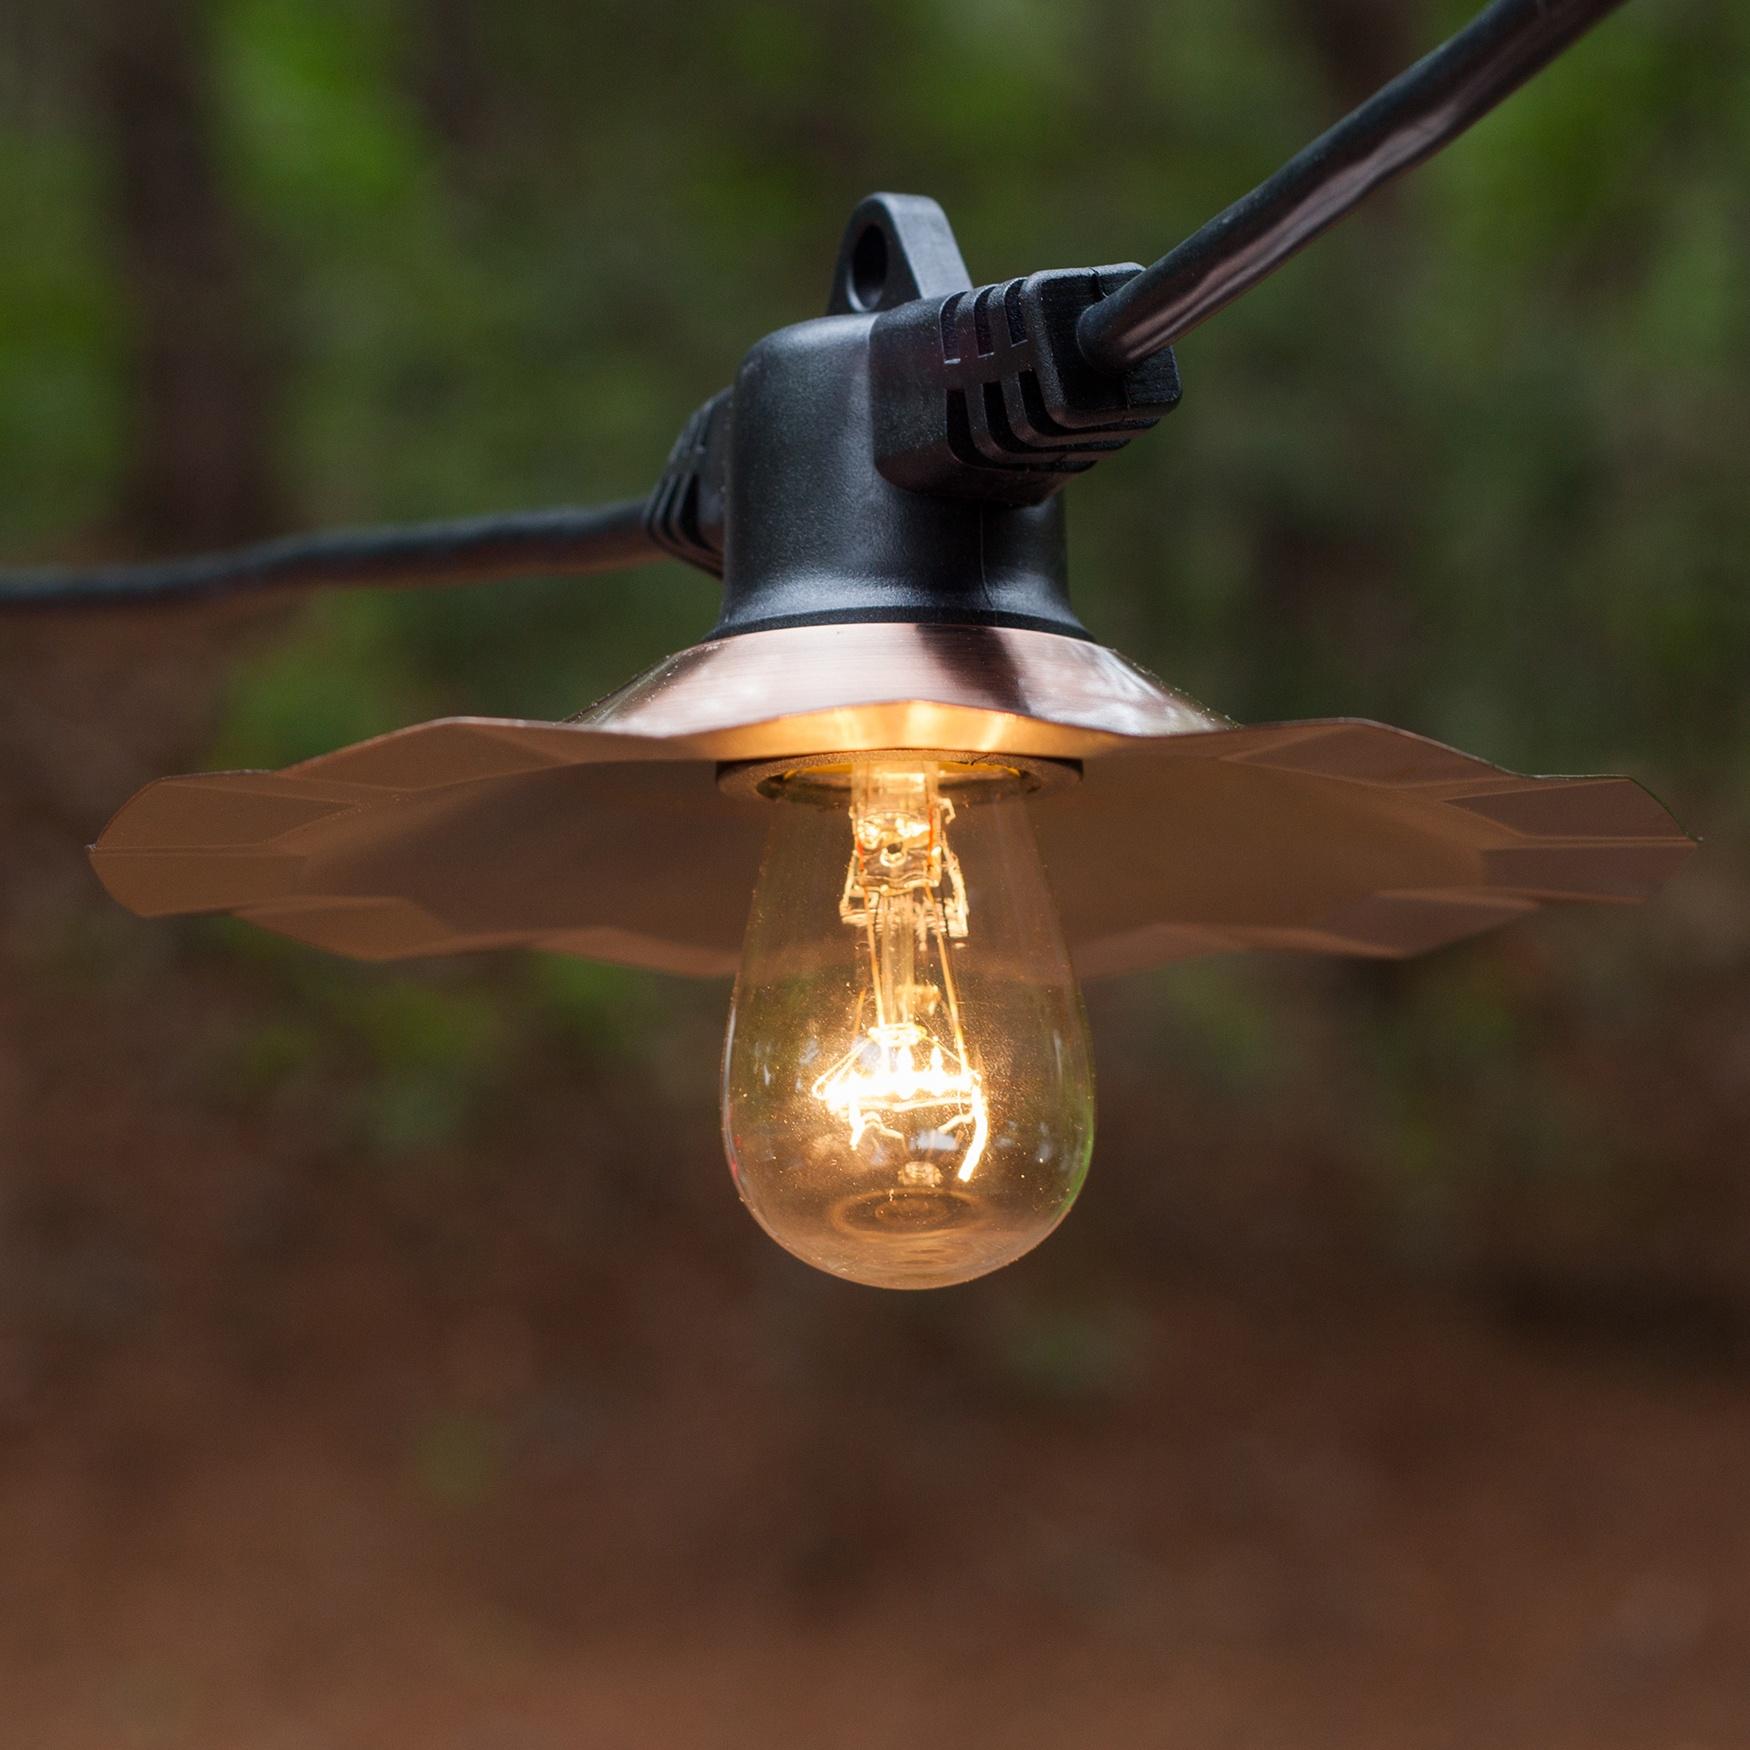 modren commercial patio lights string backyard i with inspir